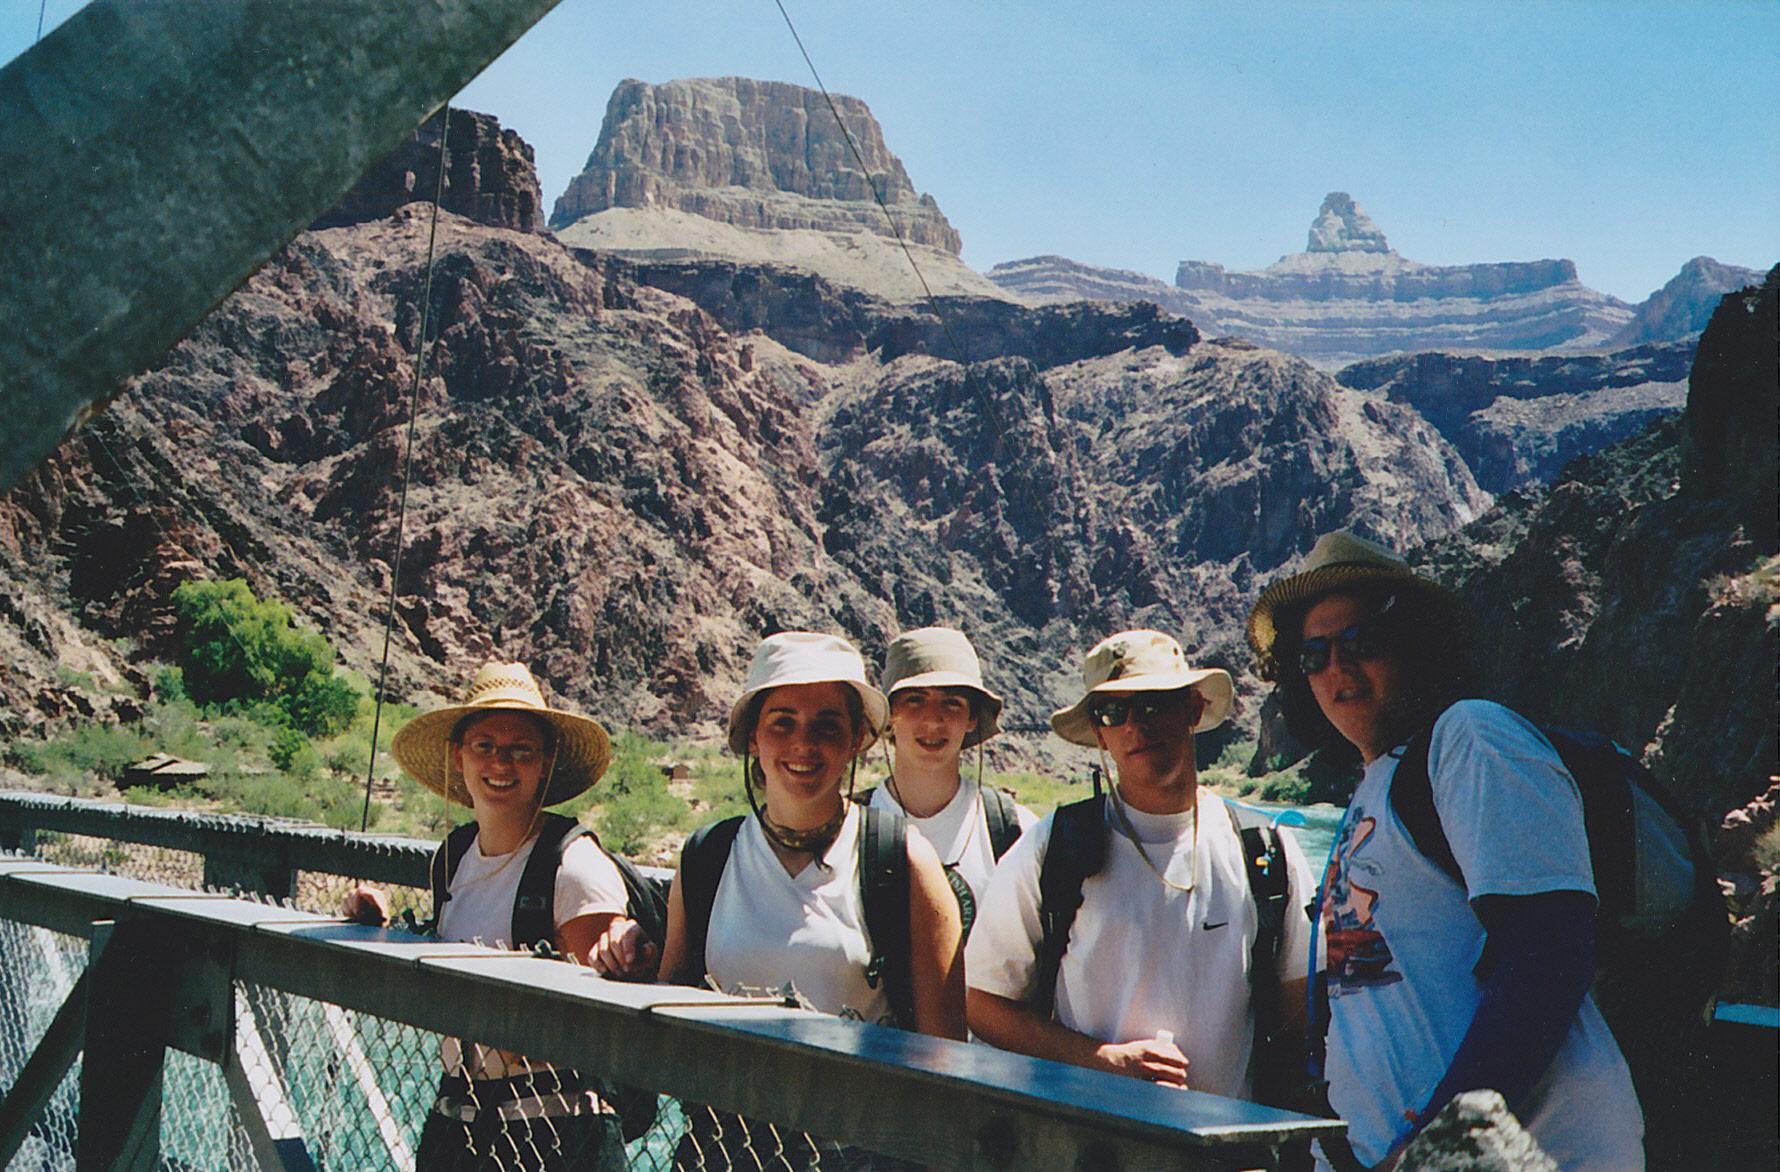 Kids at Silver bridge, Grand Canyon